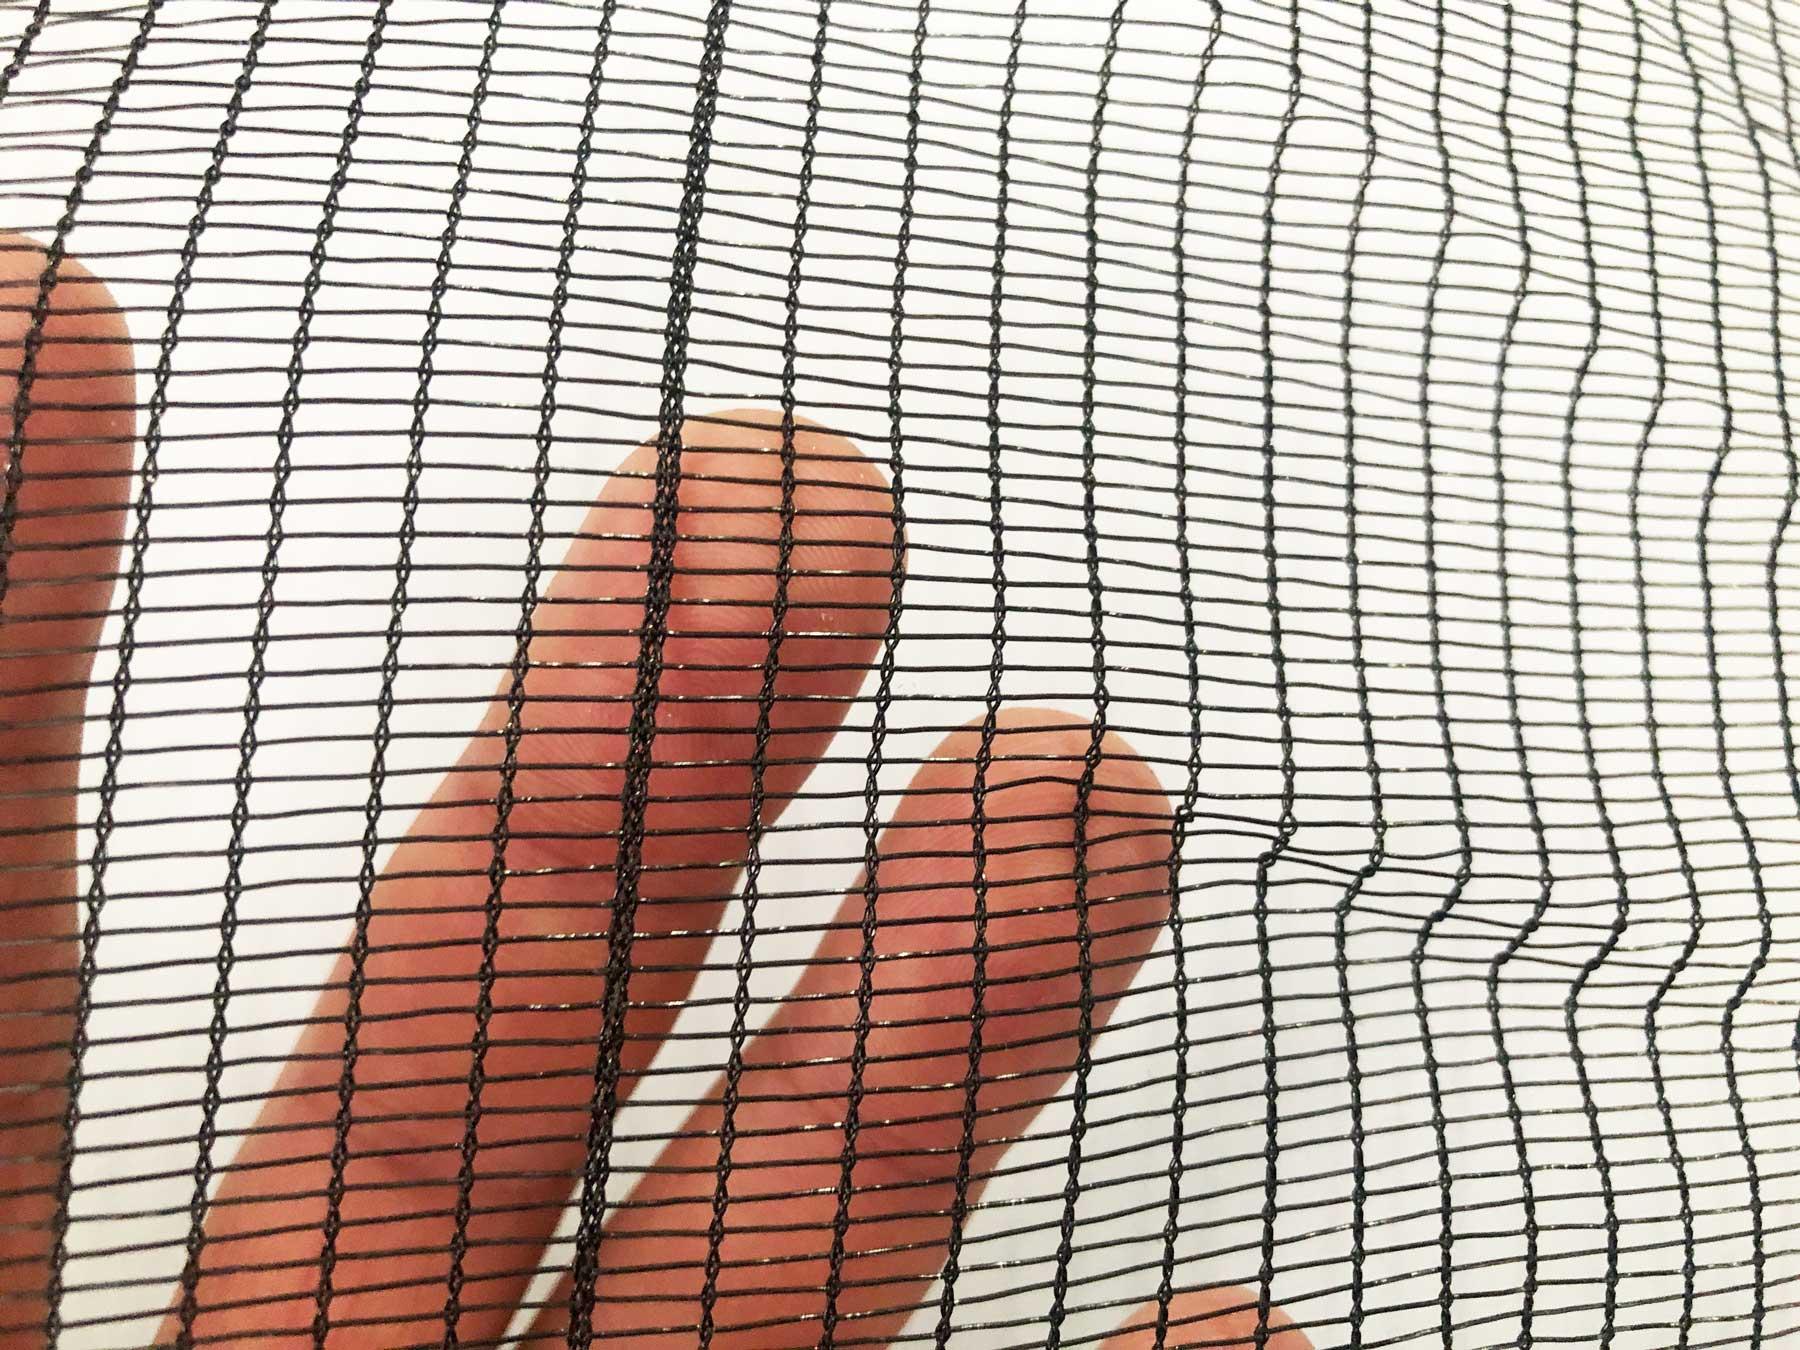 Tela Sombrite Nylon Monofilamento com Giro Inglês 50% 3x40